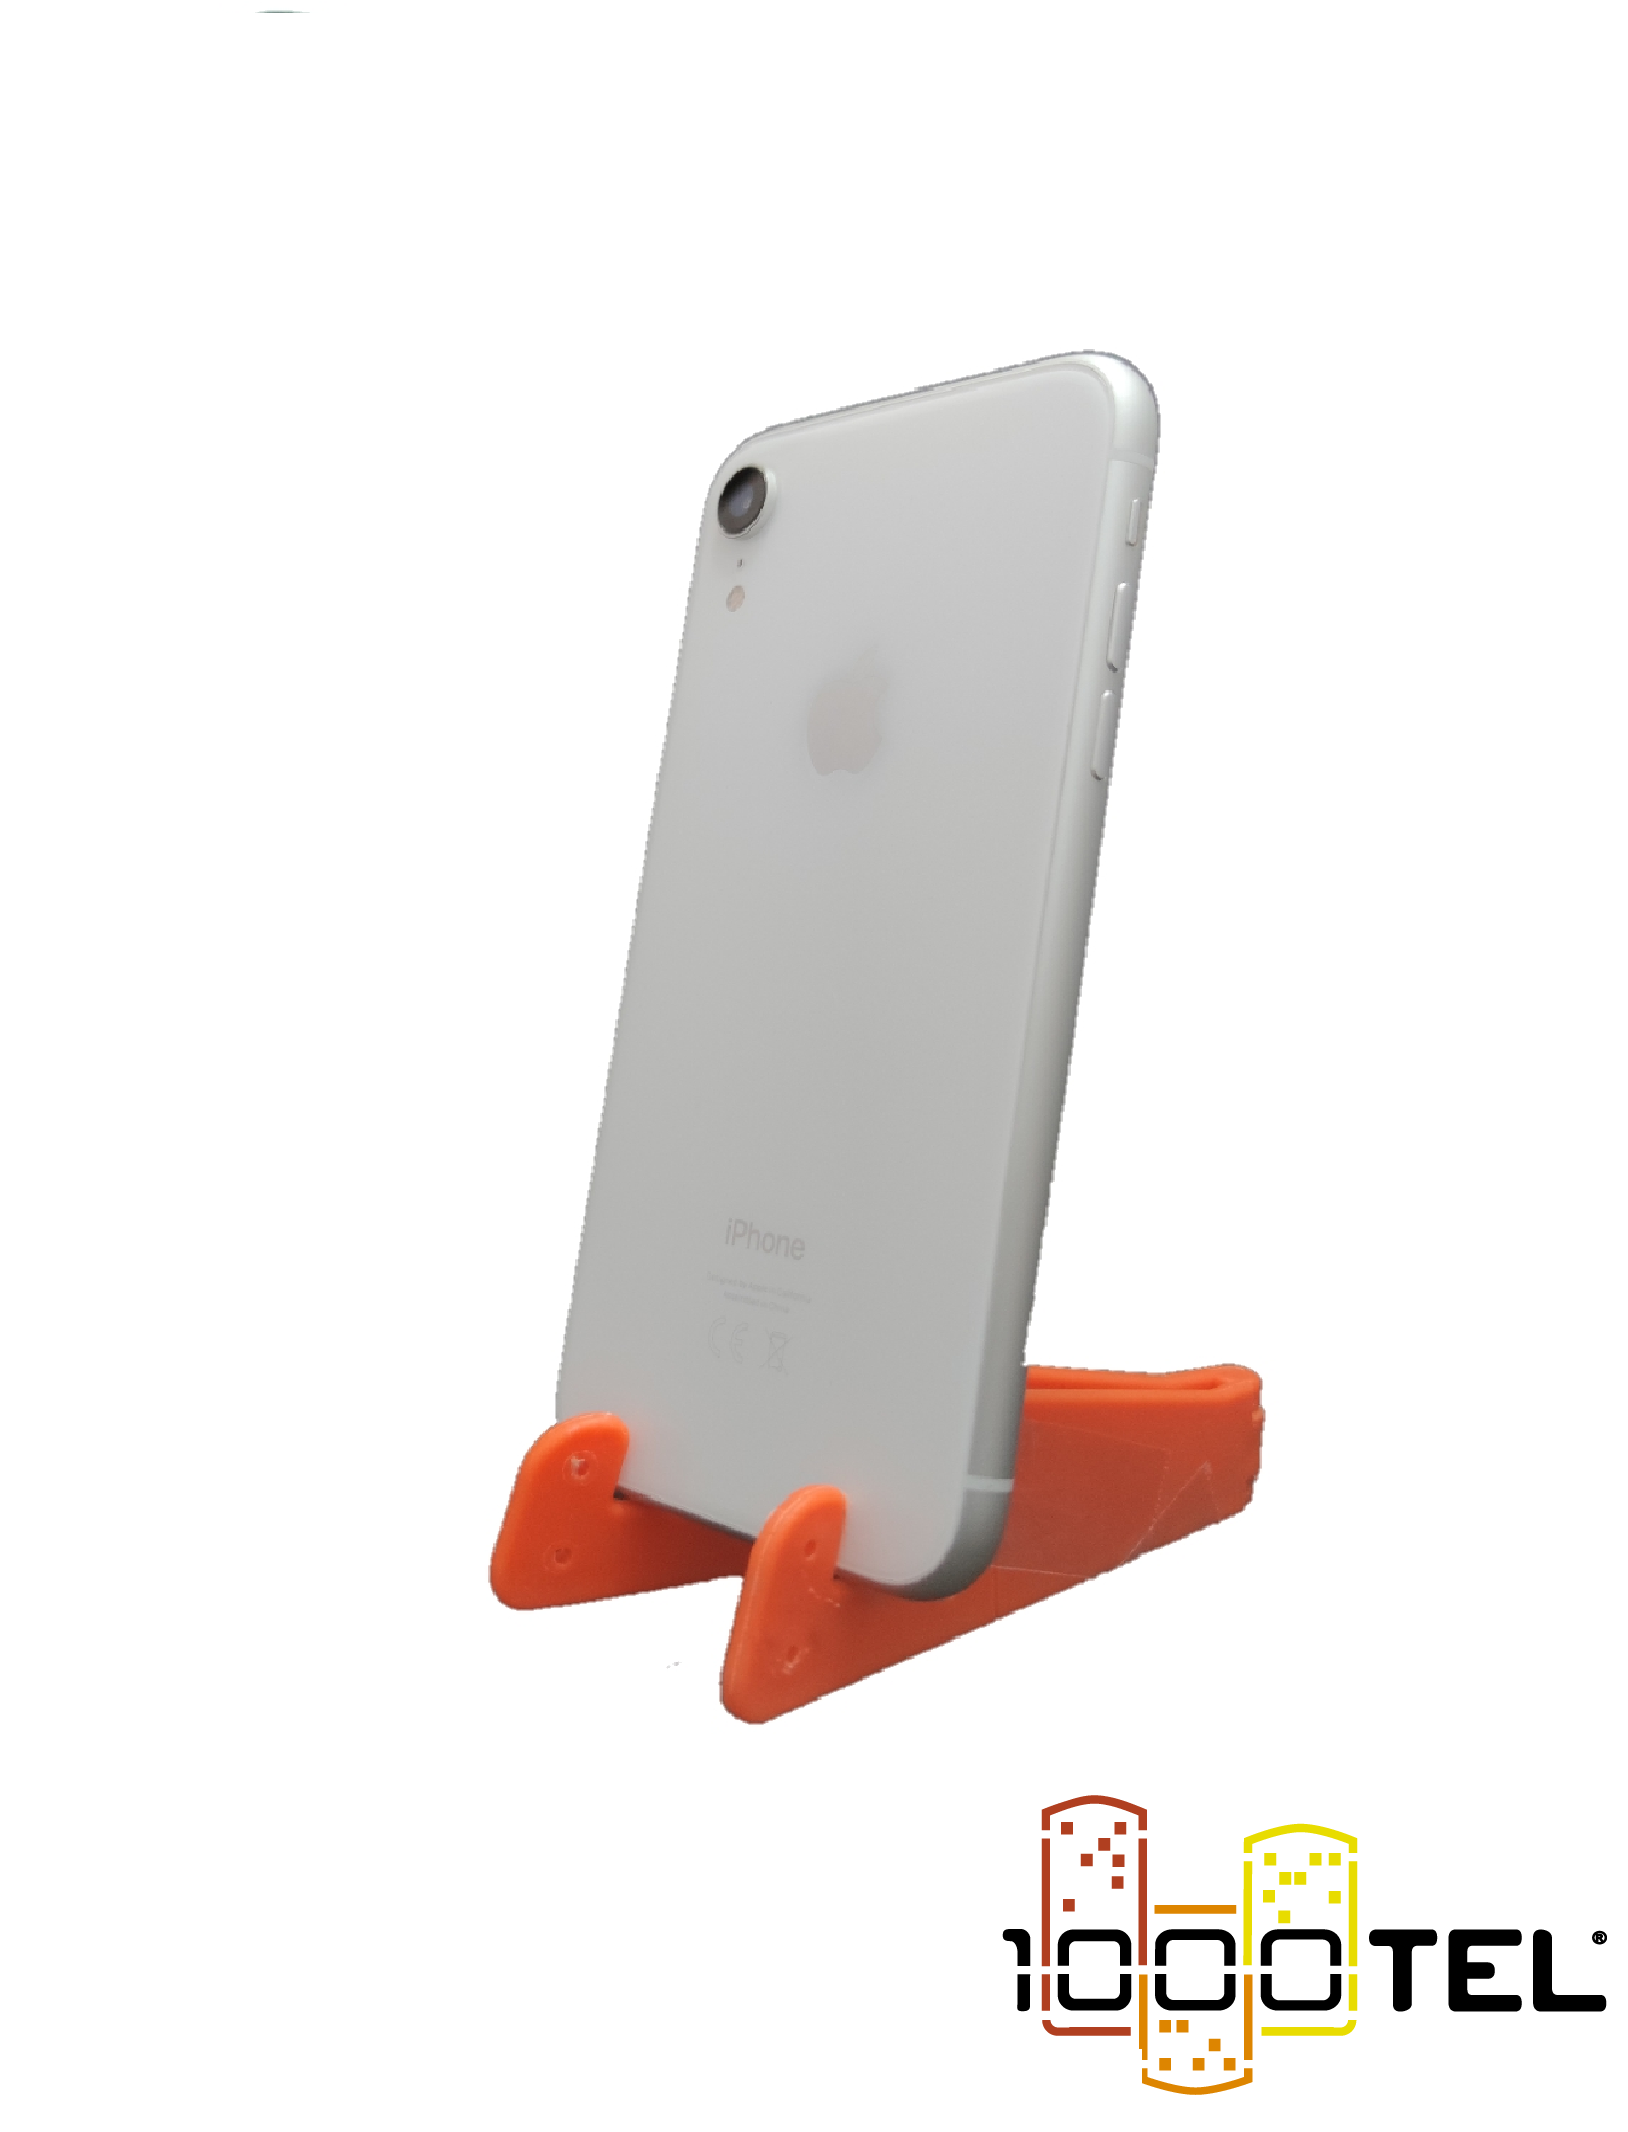 Iphone XR 64GB #4